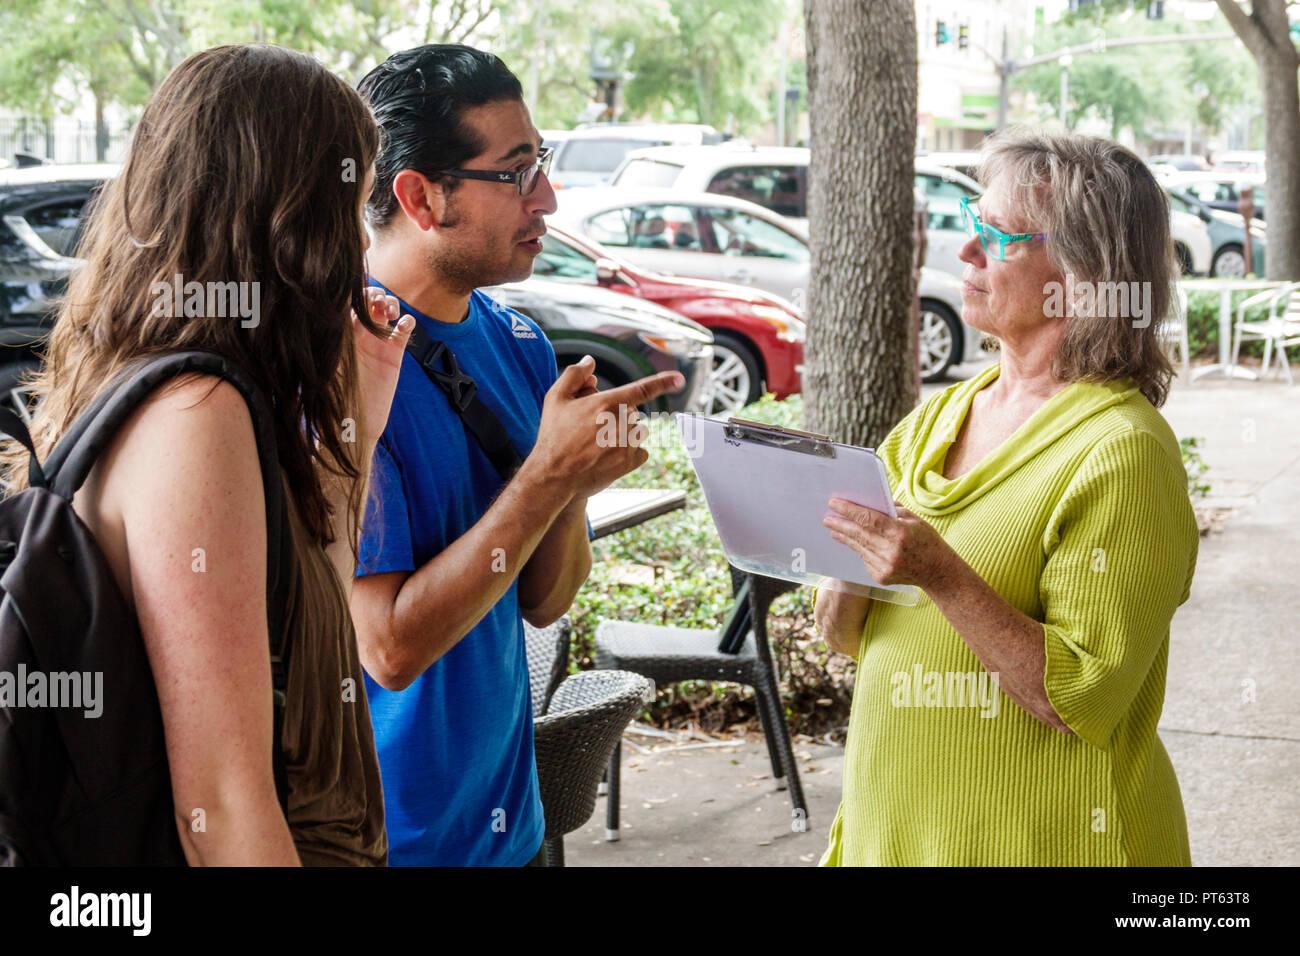 St. Saint Petersburg Florida Central Avenue survey questionnaire opinion poll woman man asking questions street sidewalk couple - Stock Image